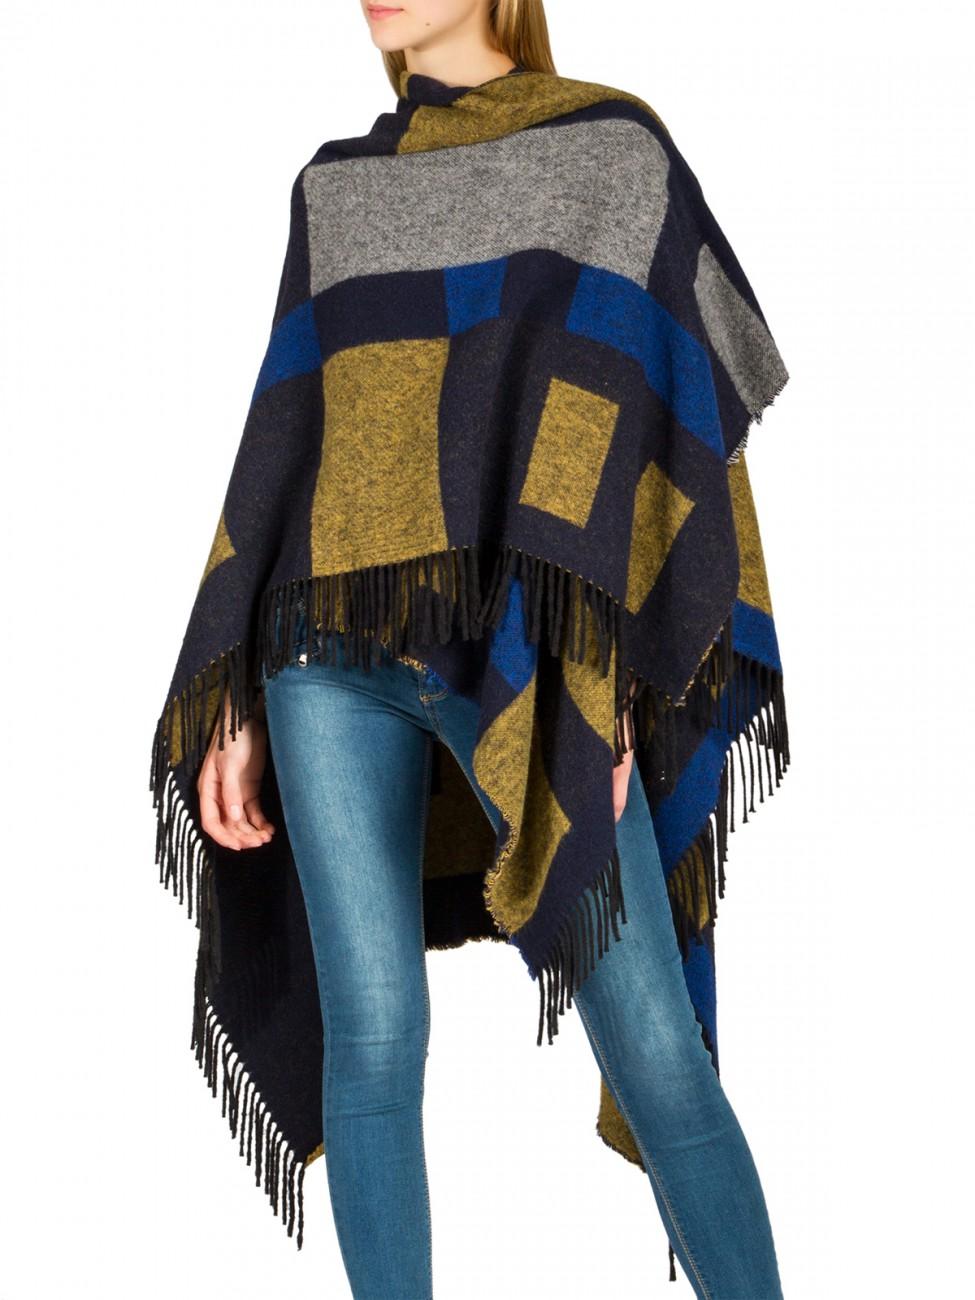 caspar damen poncho warm fransen strick winter cape xxl. Black Bedroom Furniture Sets. Home Design Ideas